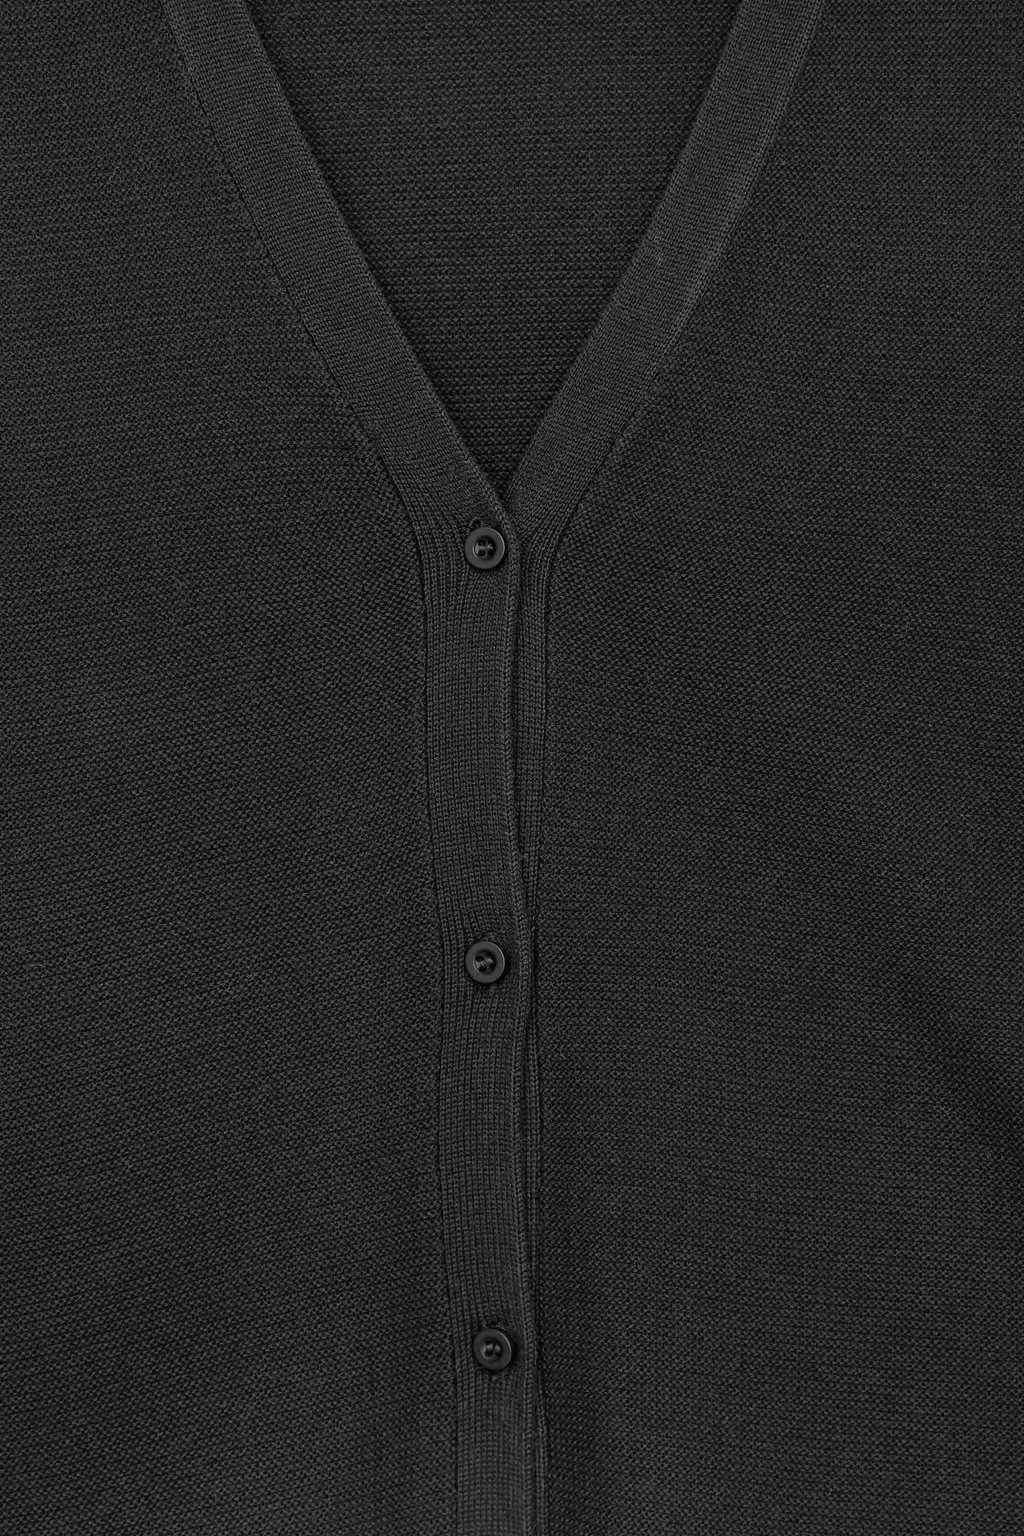 Cardigan 3179 Black 8